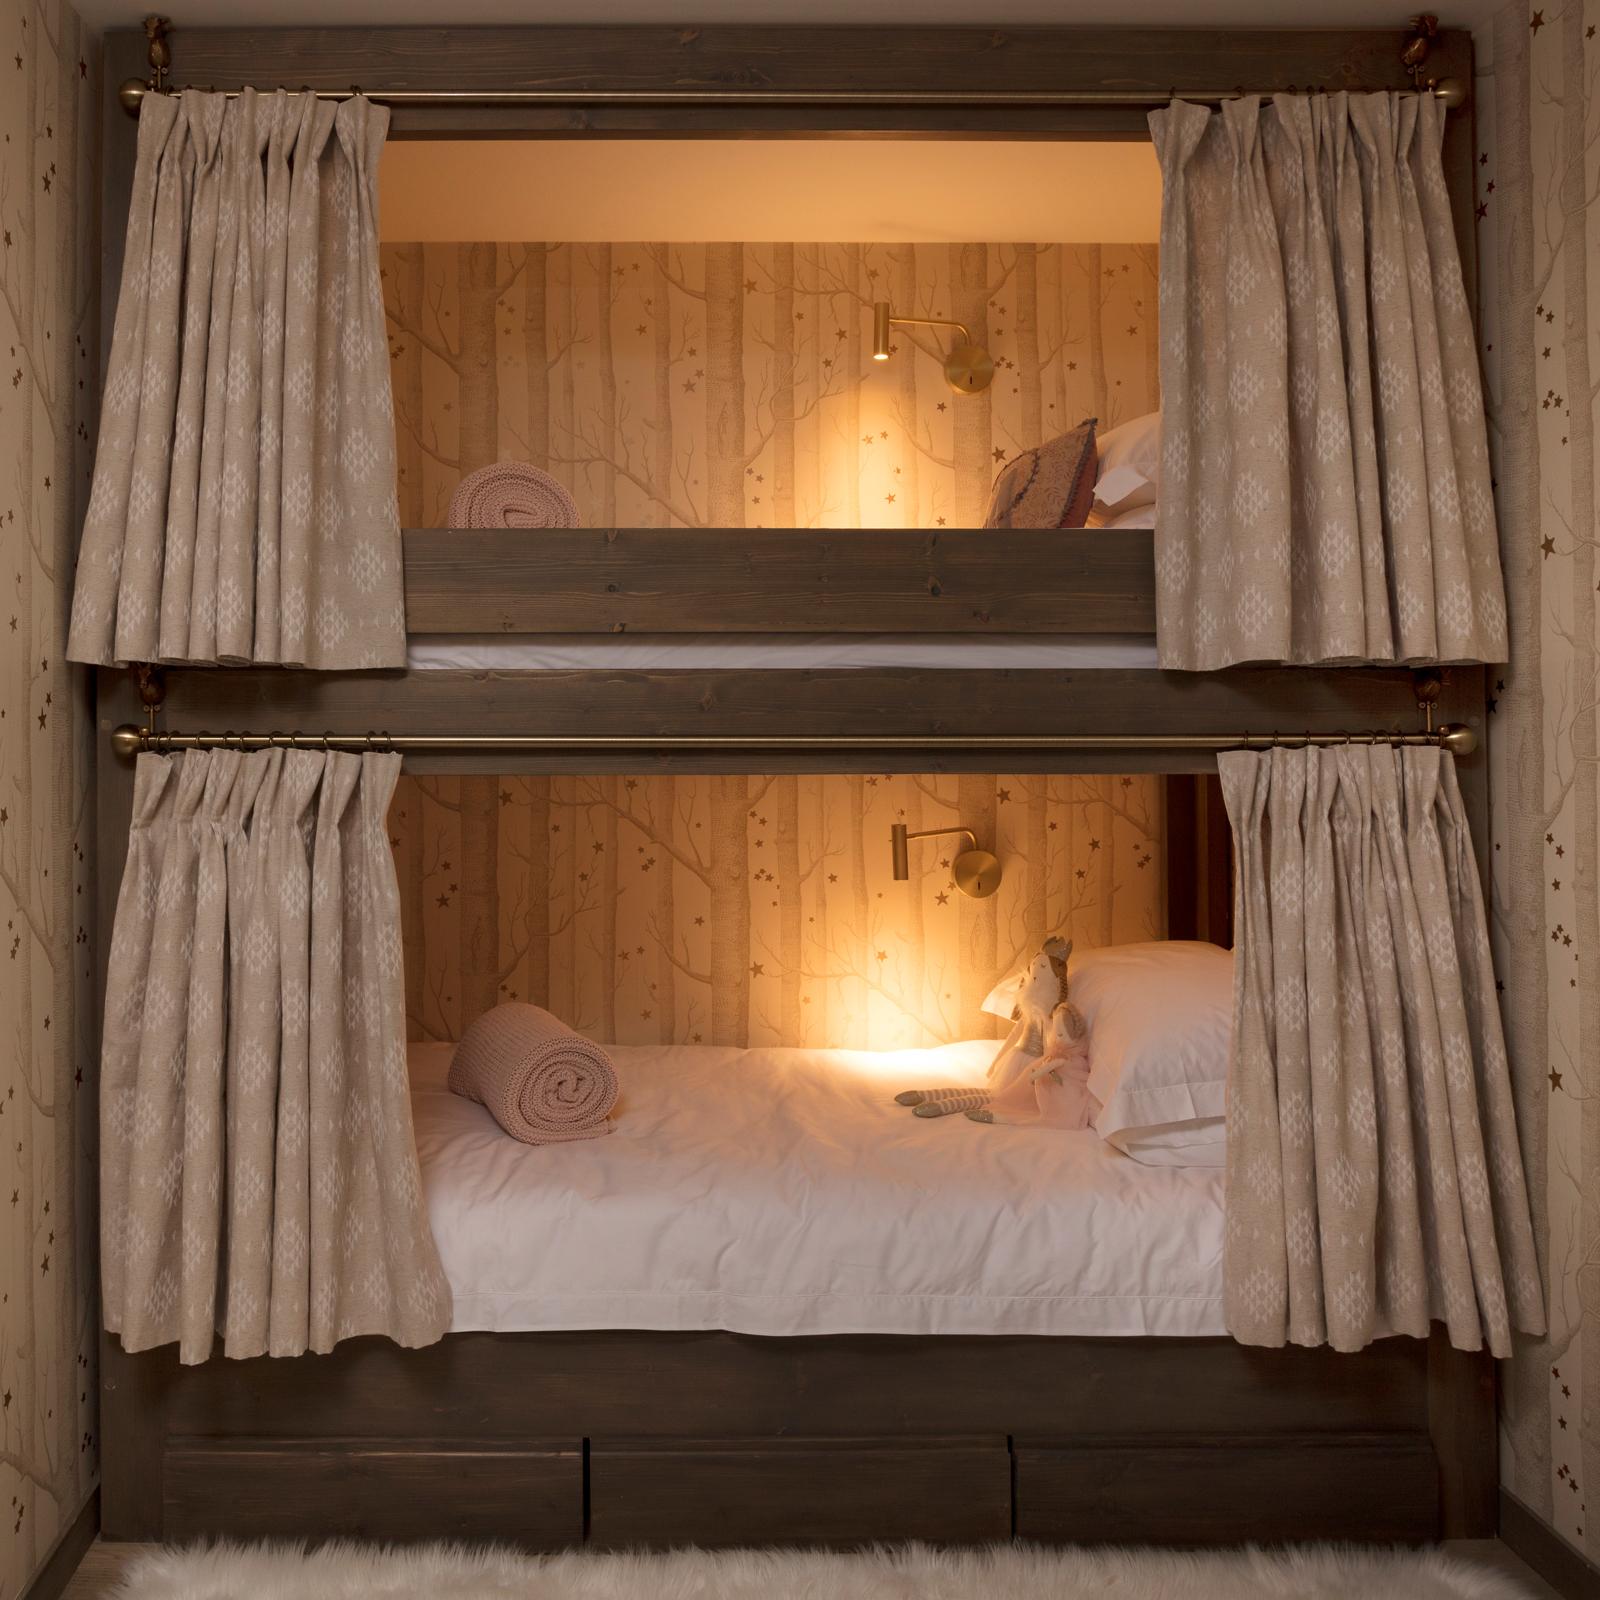 Chalet Mirabelle's magical bunk beds